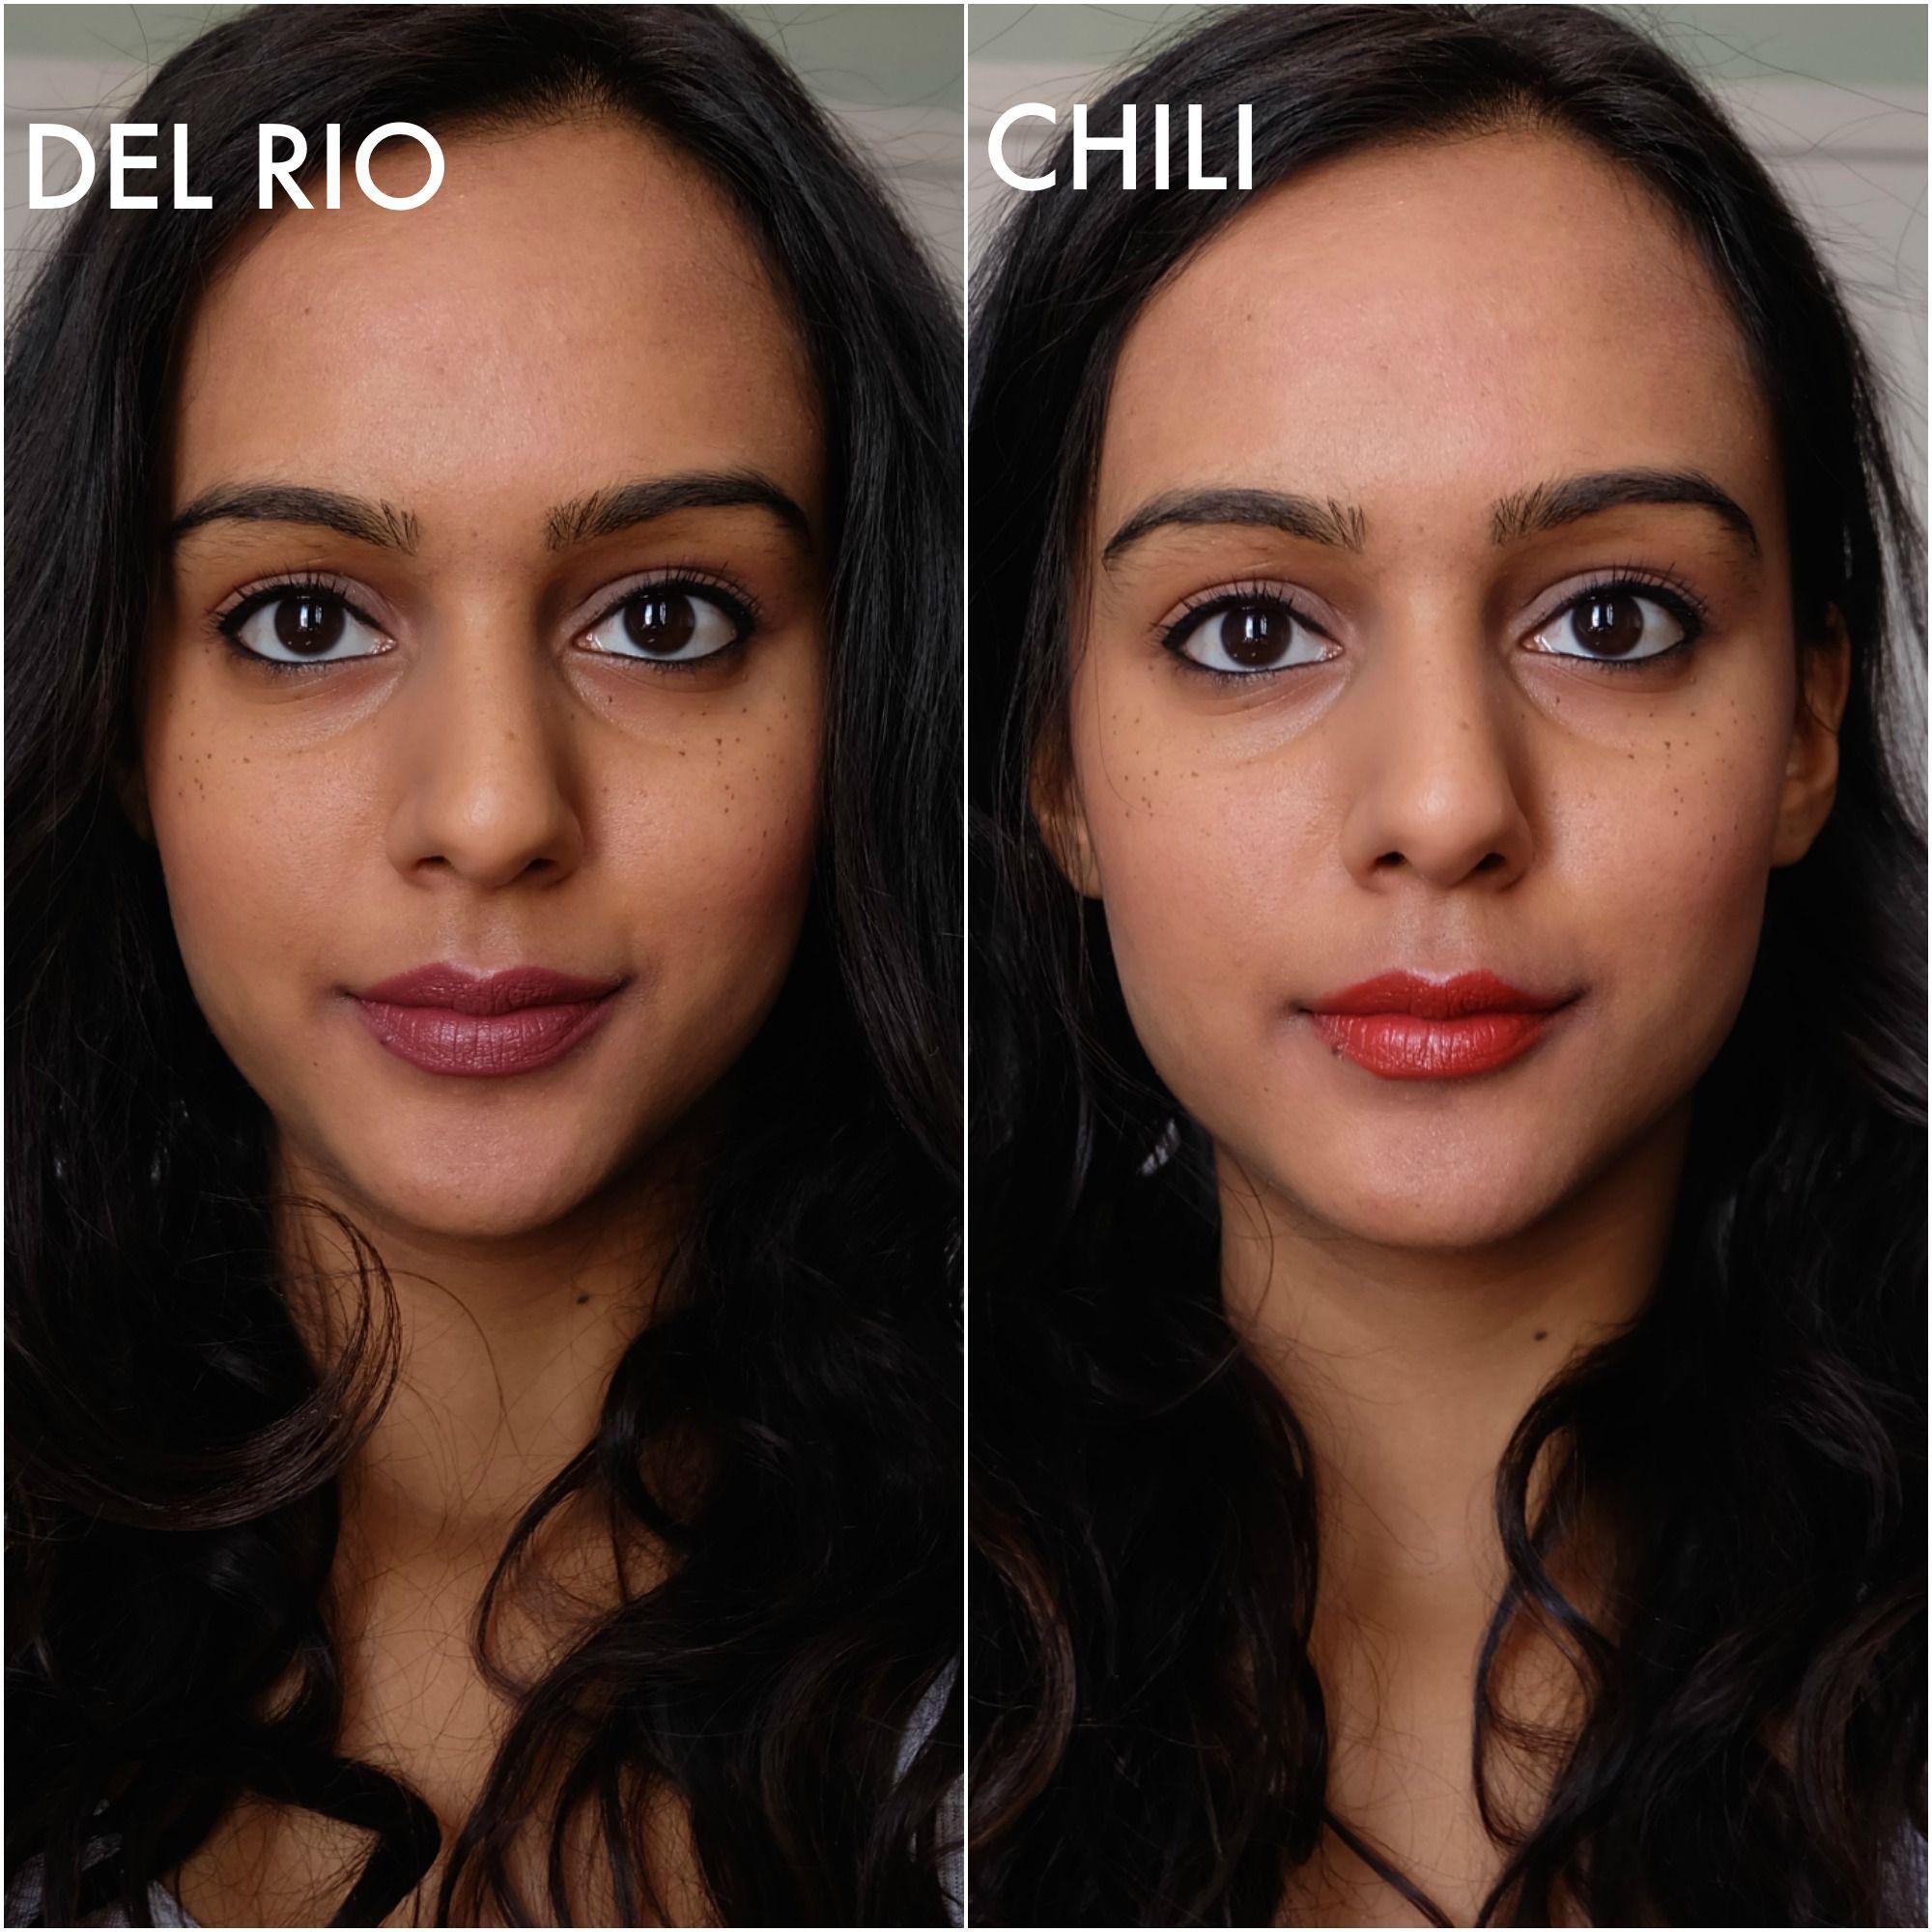 Top Mac Lipsticks For Dark Skin  Details 2  Lipstick For -5929